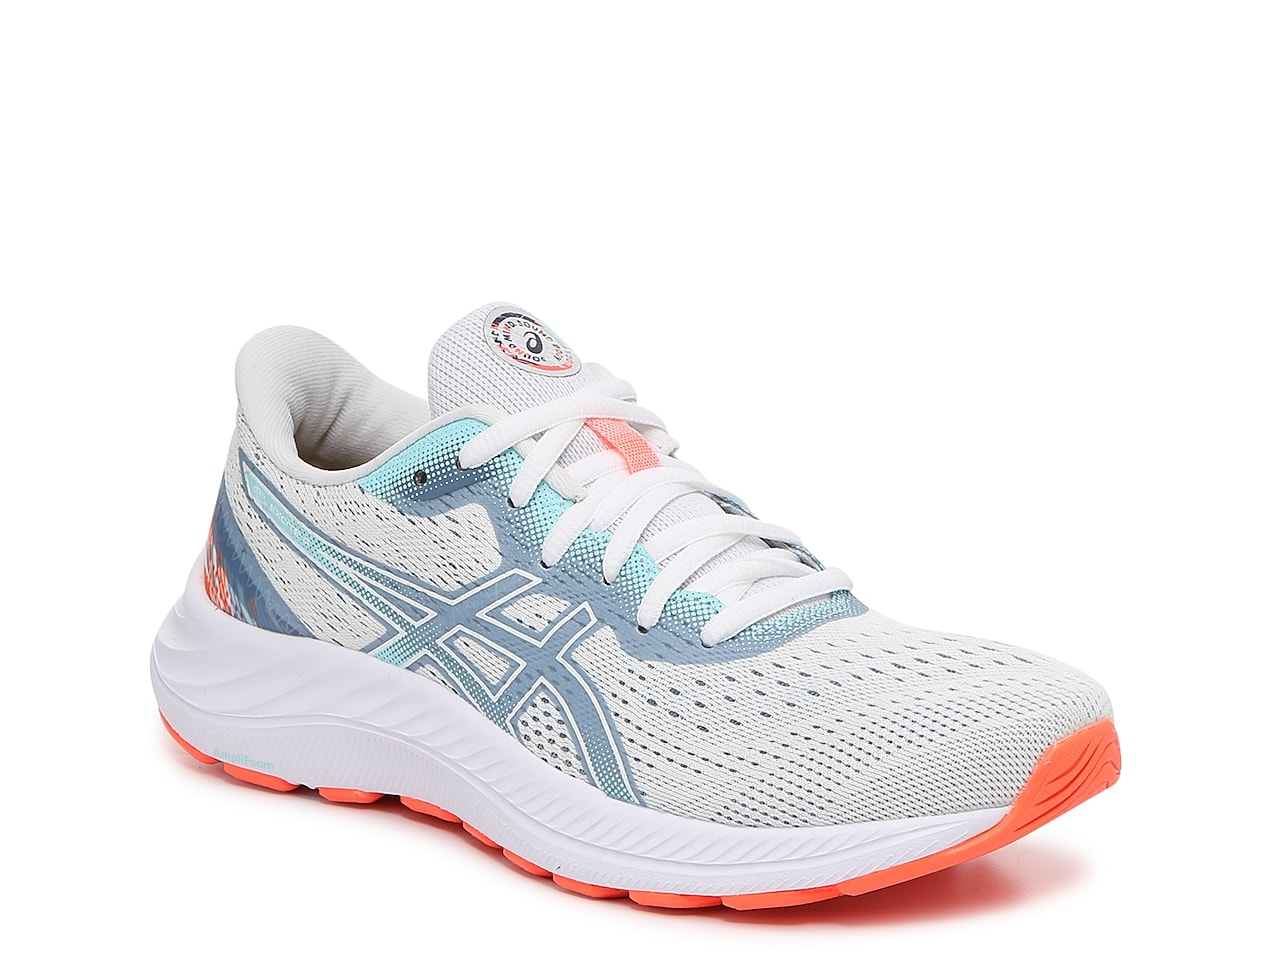 ASICS GEL-Excite 8 Running Shoe - Women's